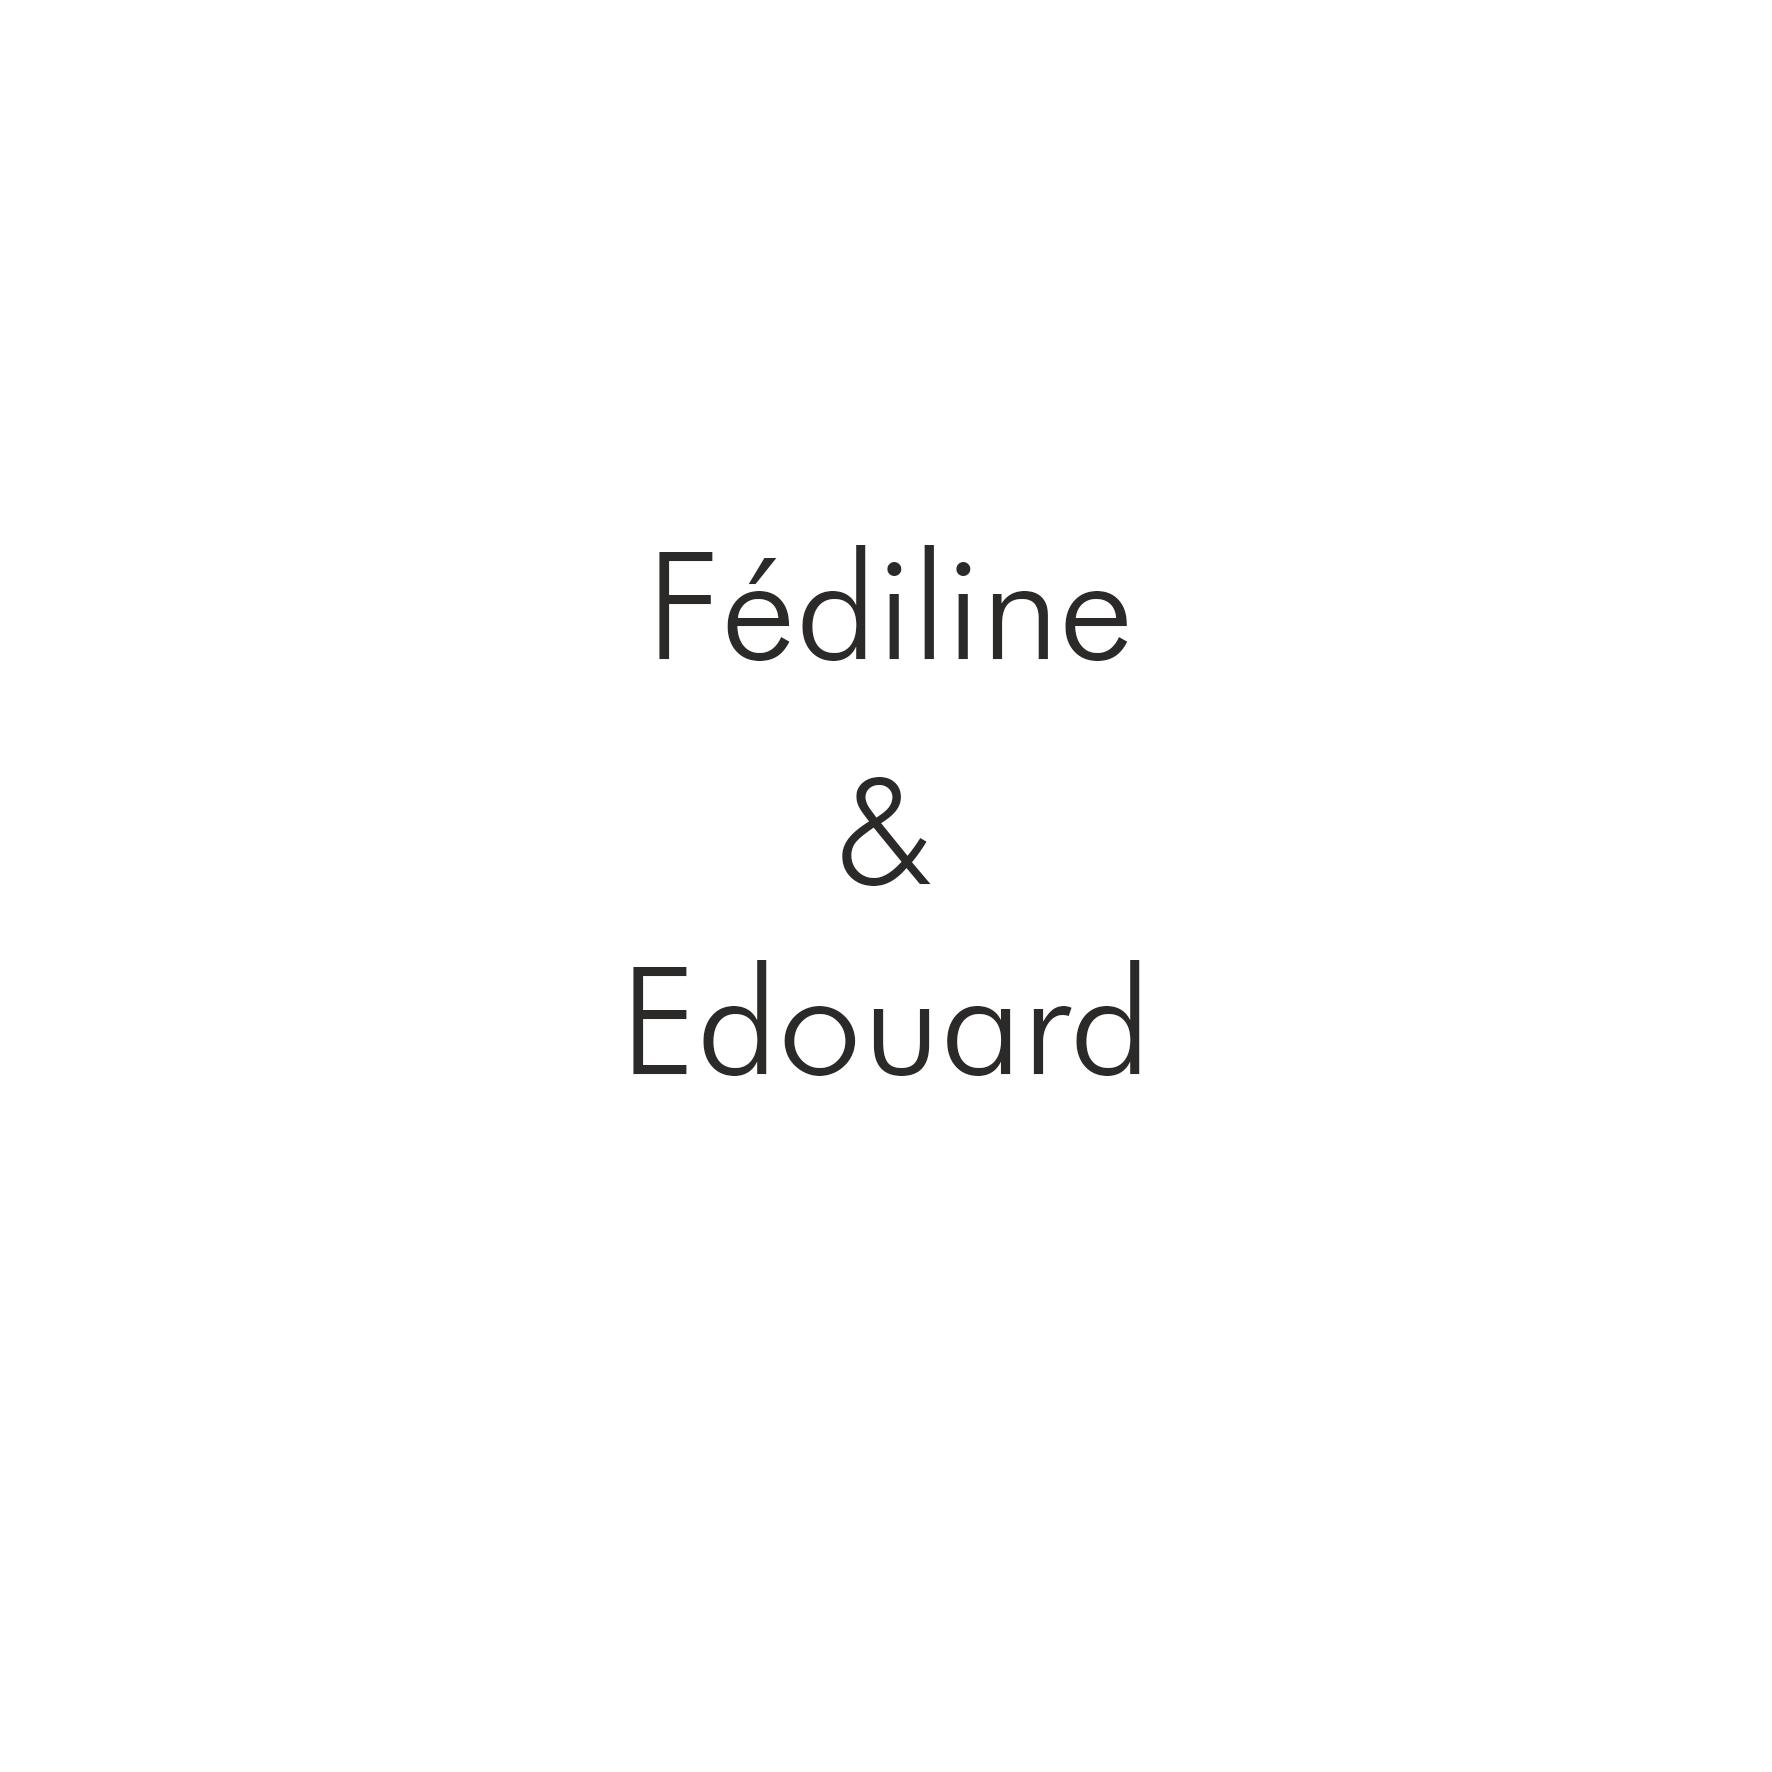 Fédiline & Edouard.png